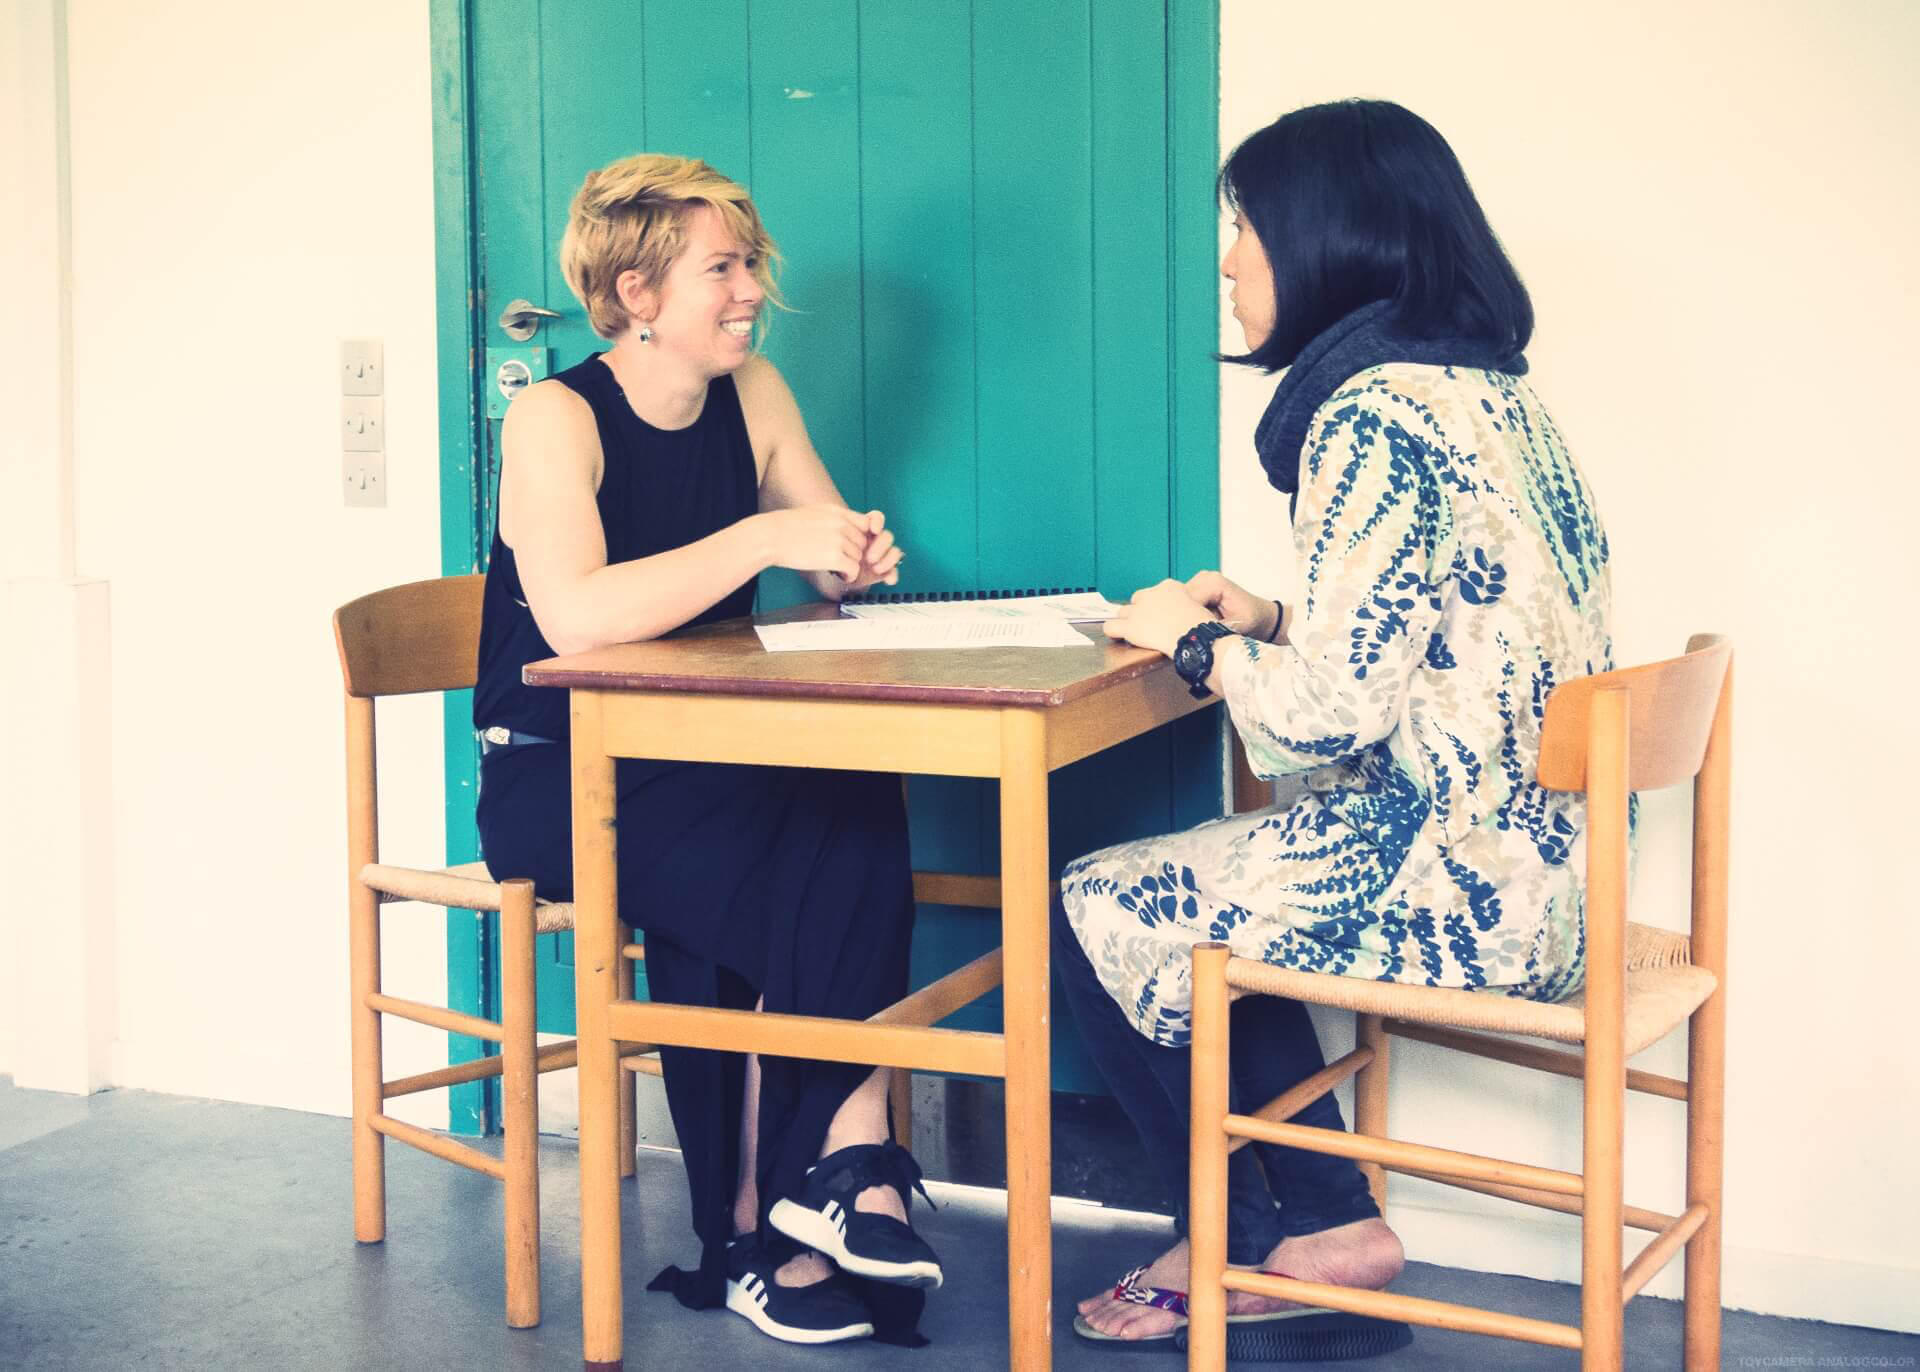 IPC - Study Counseling at International People's College a Danish Folk High School